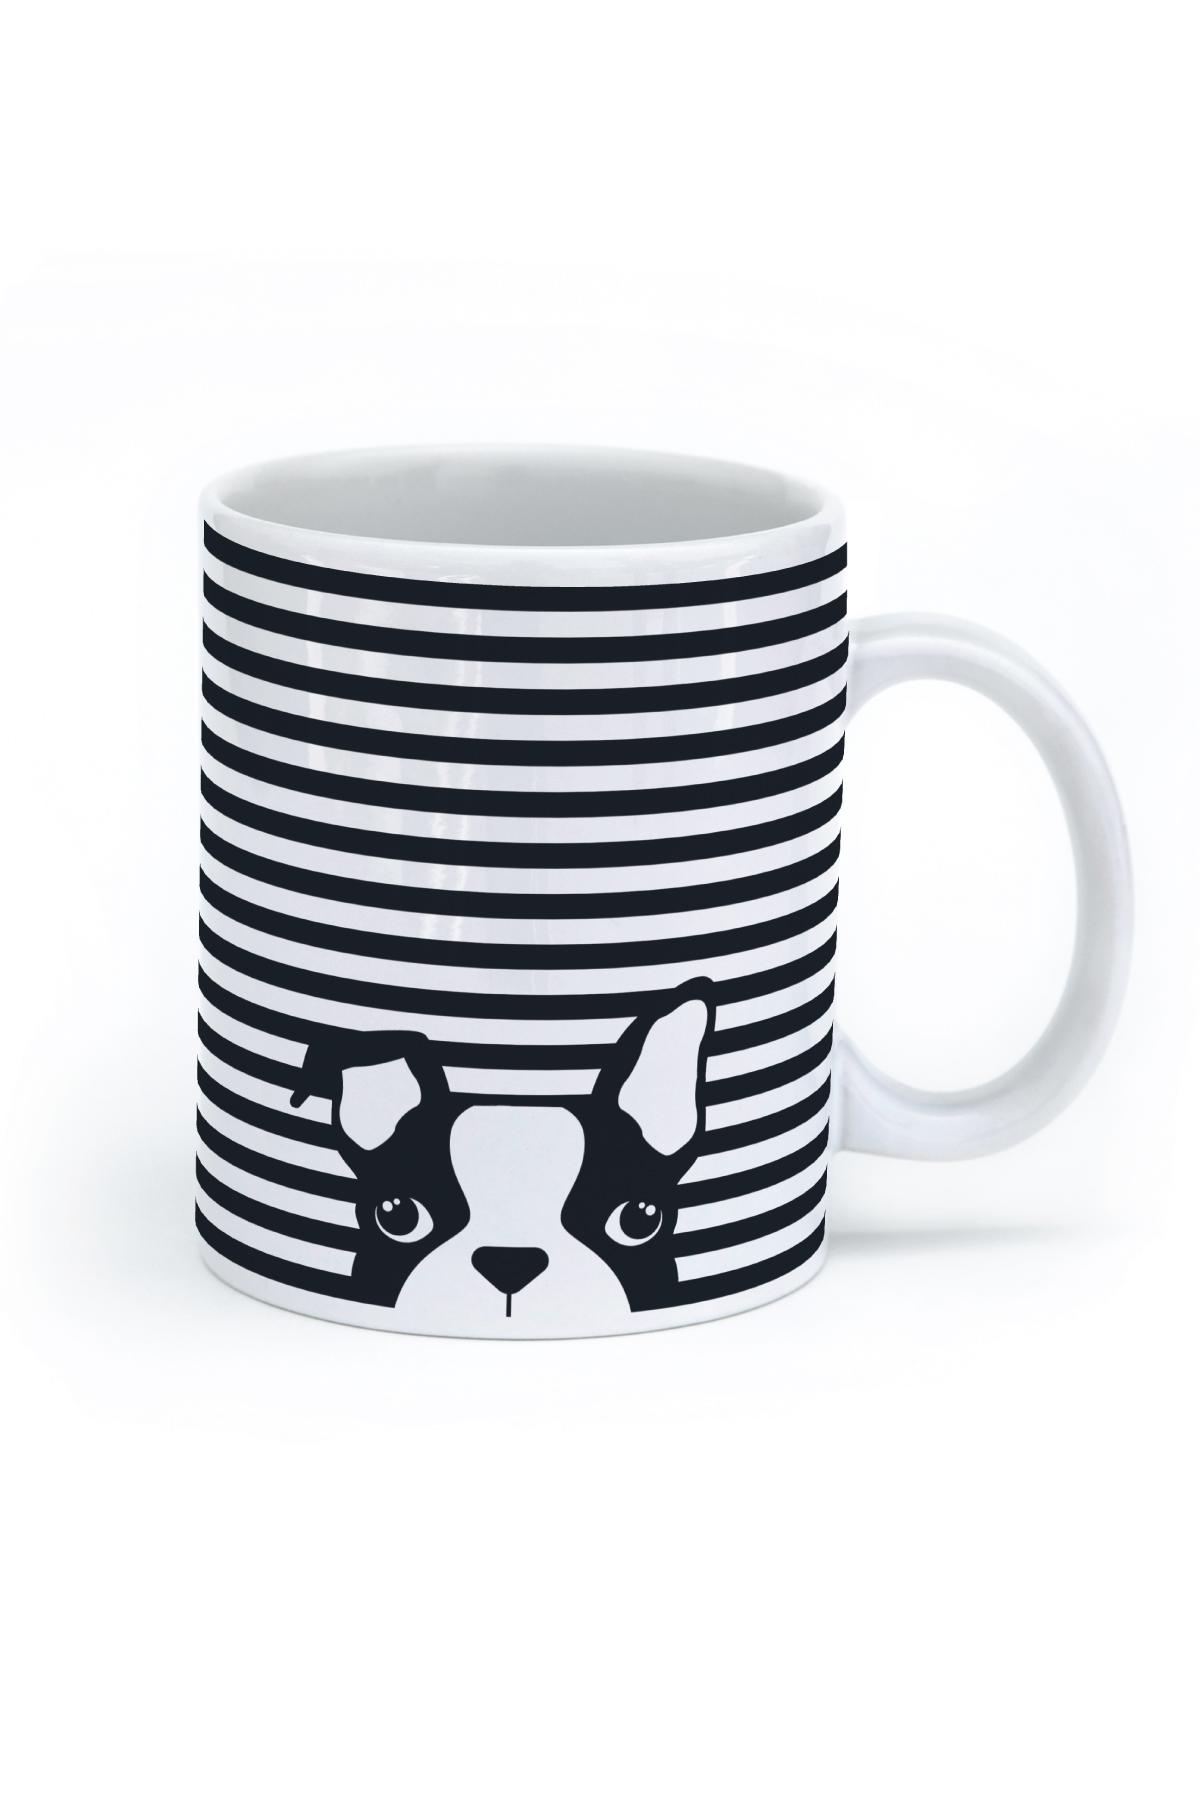 Mug clipart striped. Seltzer goods dog stripe